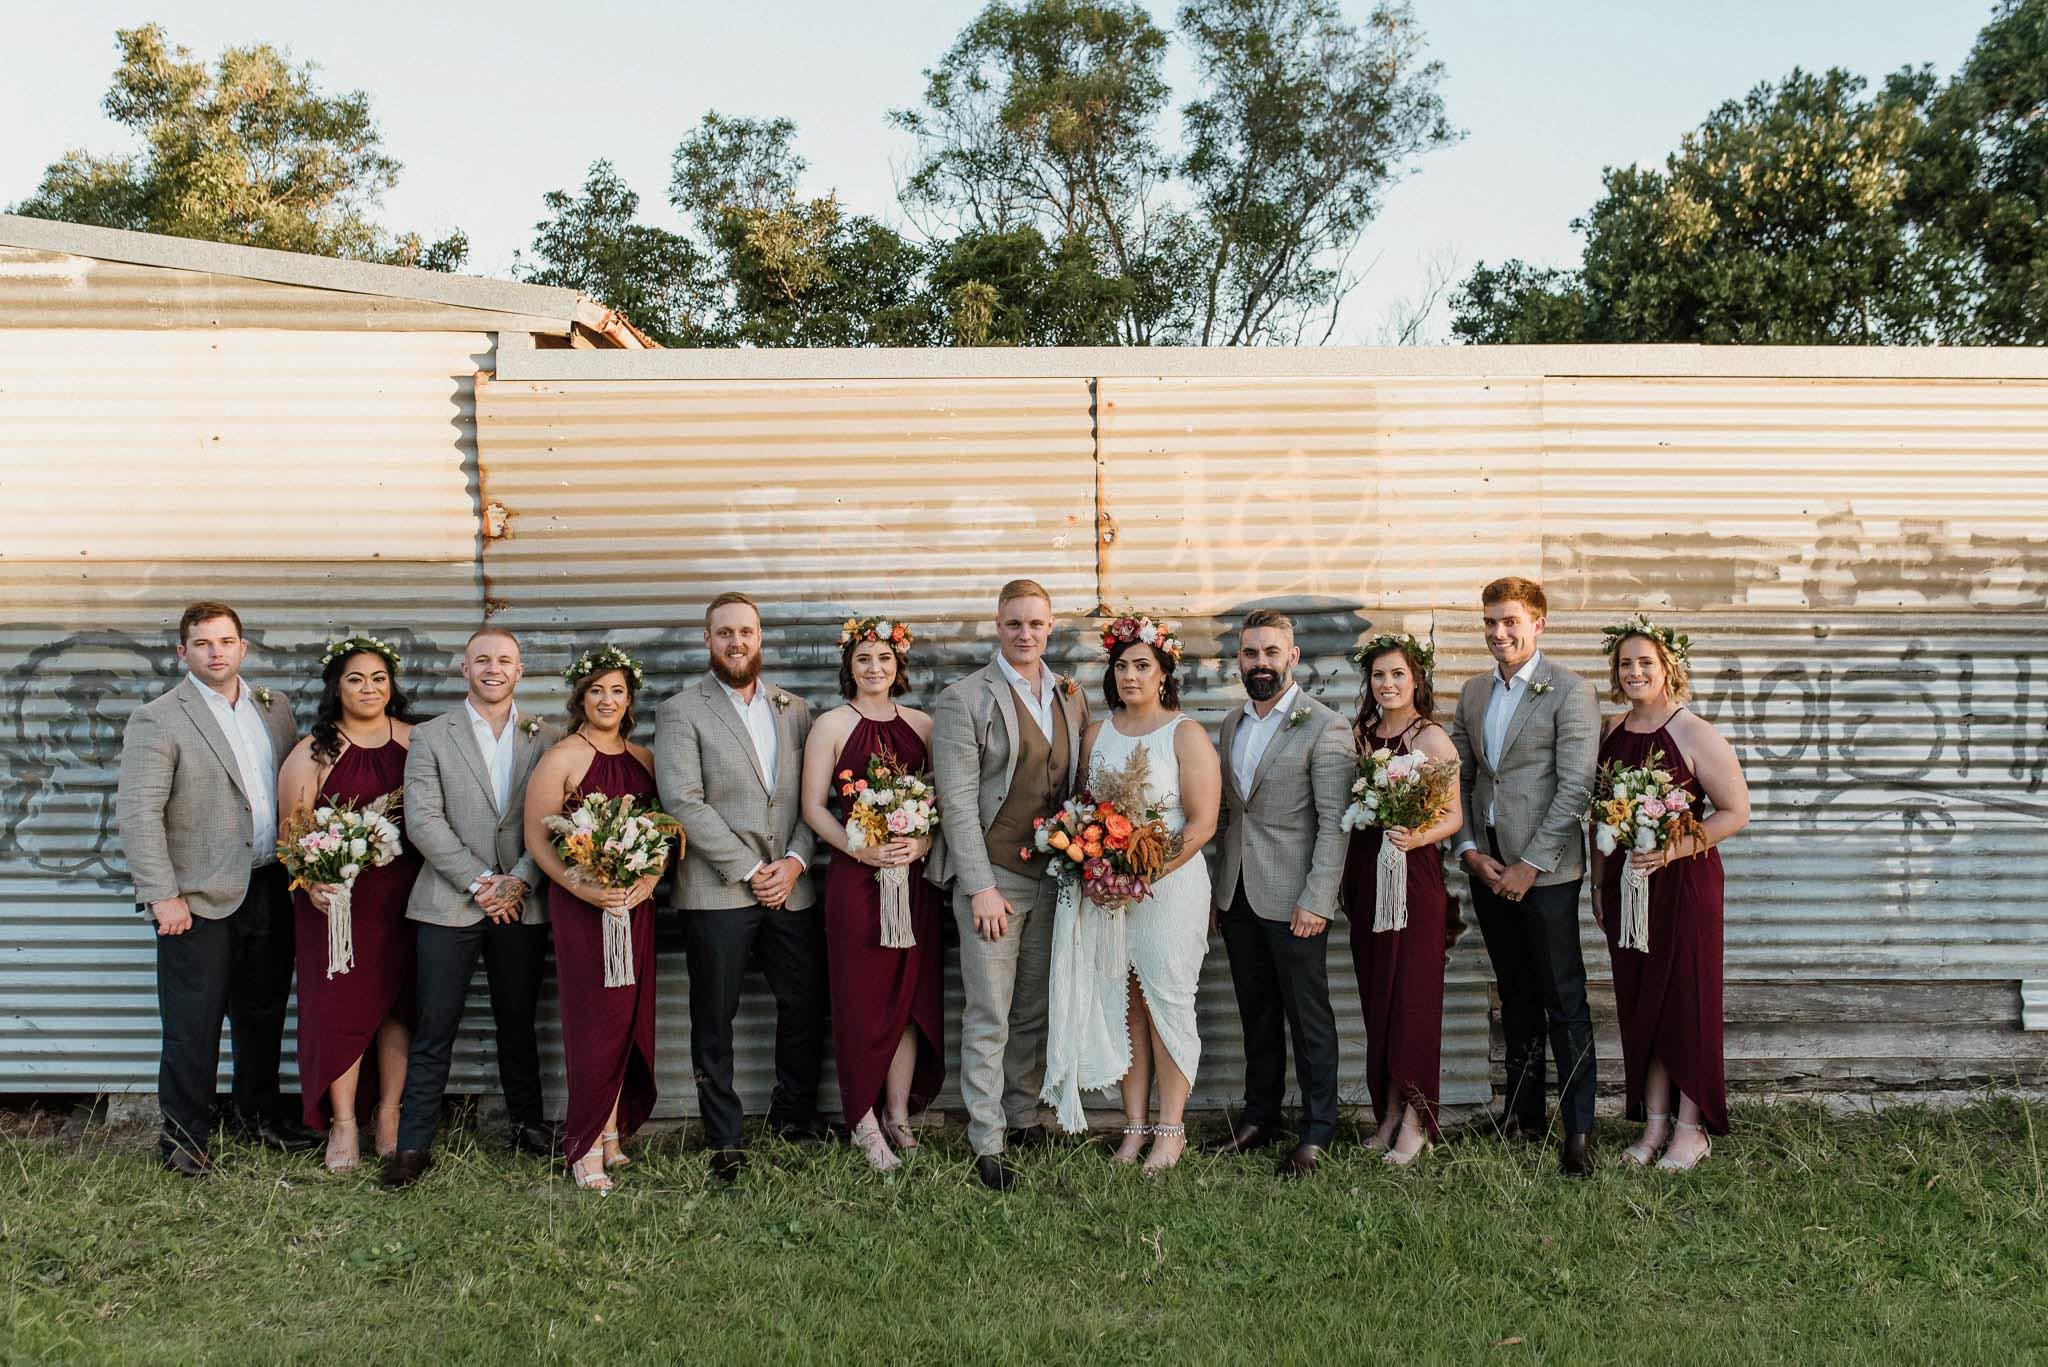 LOMONACO-WEDDING-BLOG-73.jpg